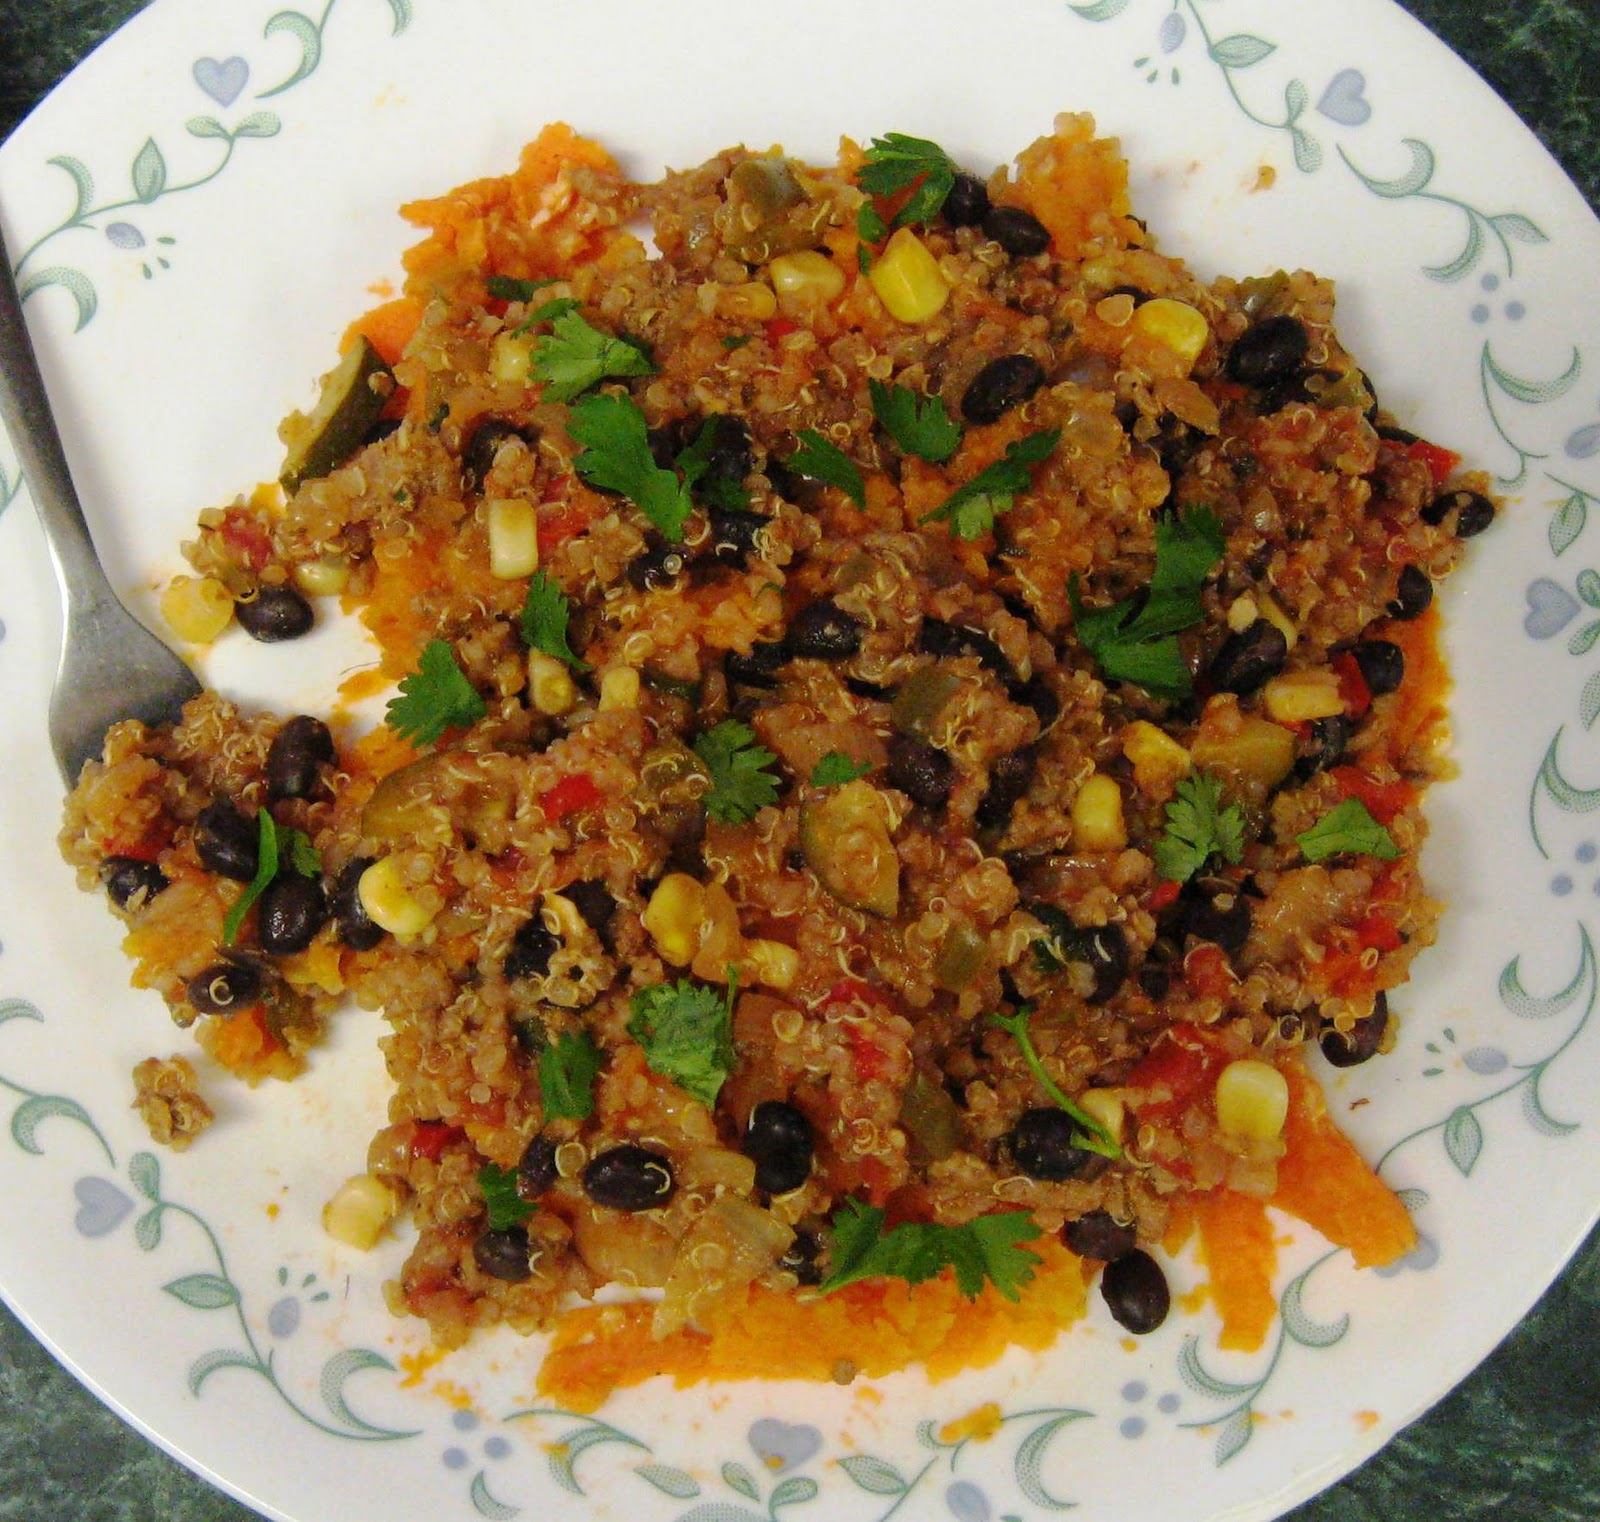 Quinoa Chili Skillet